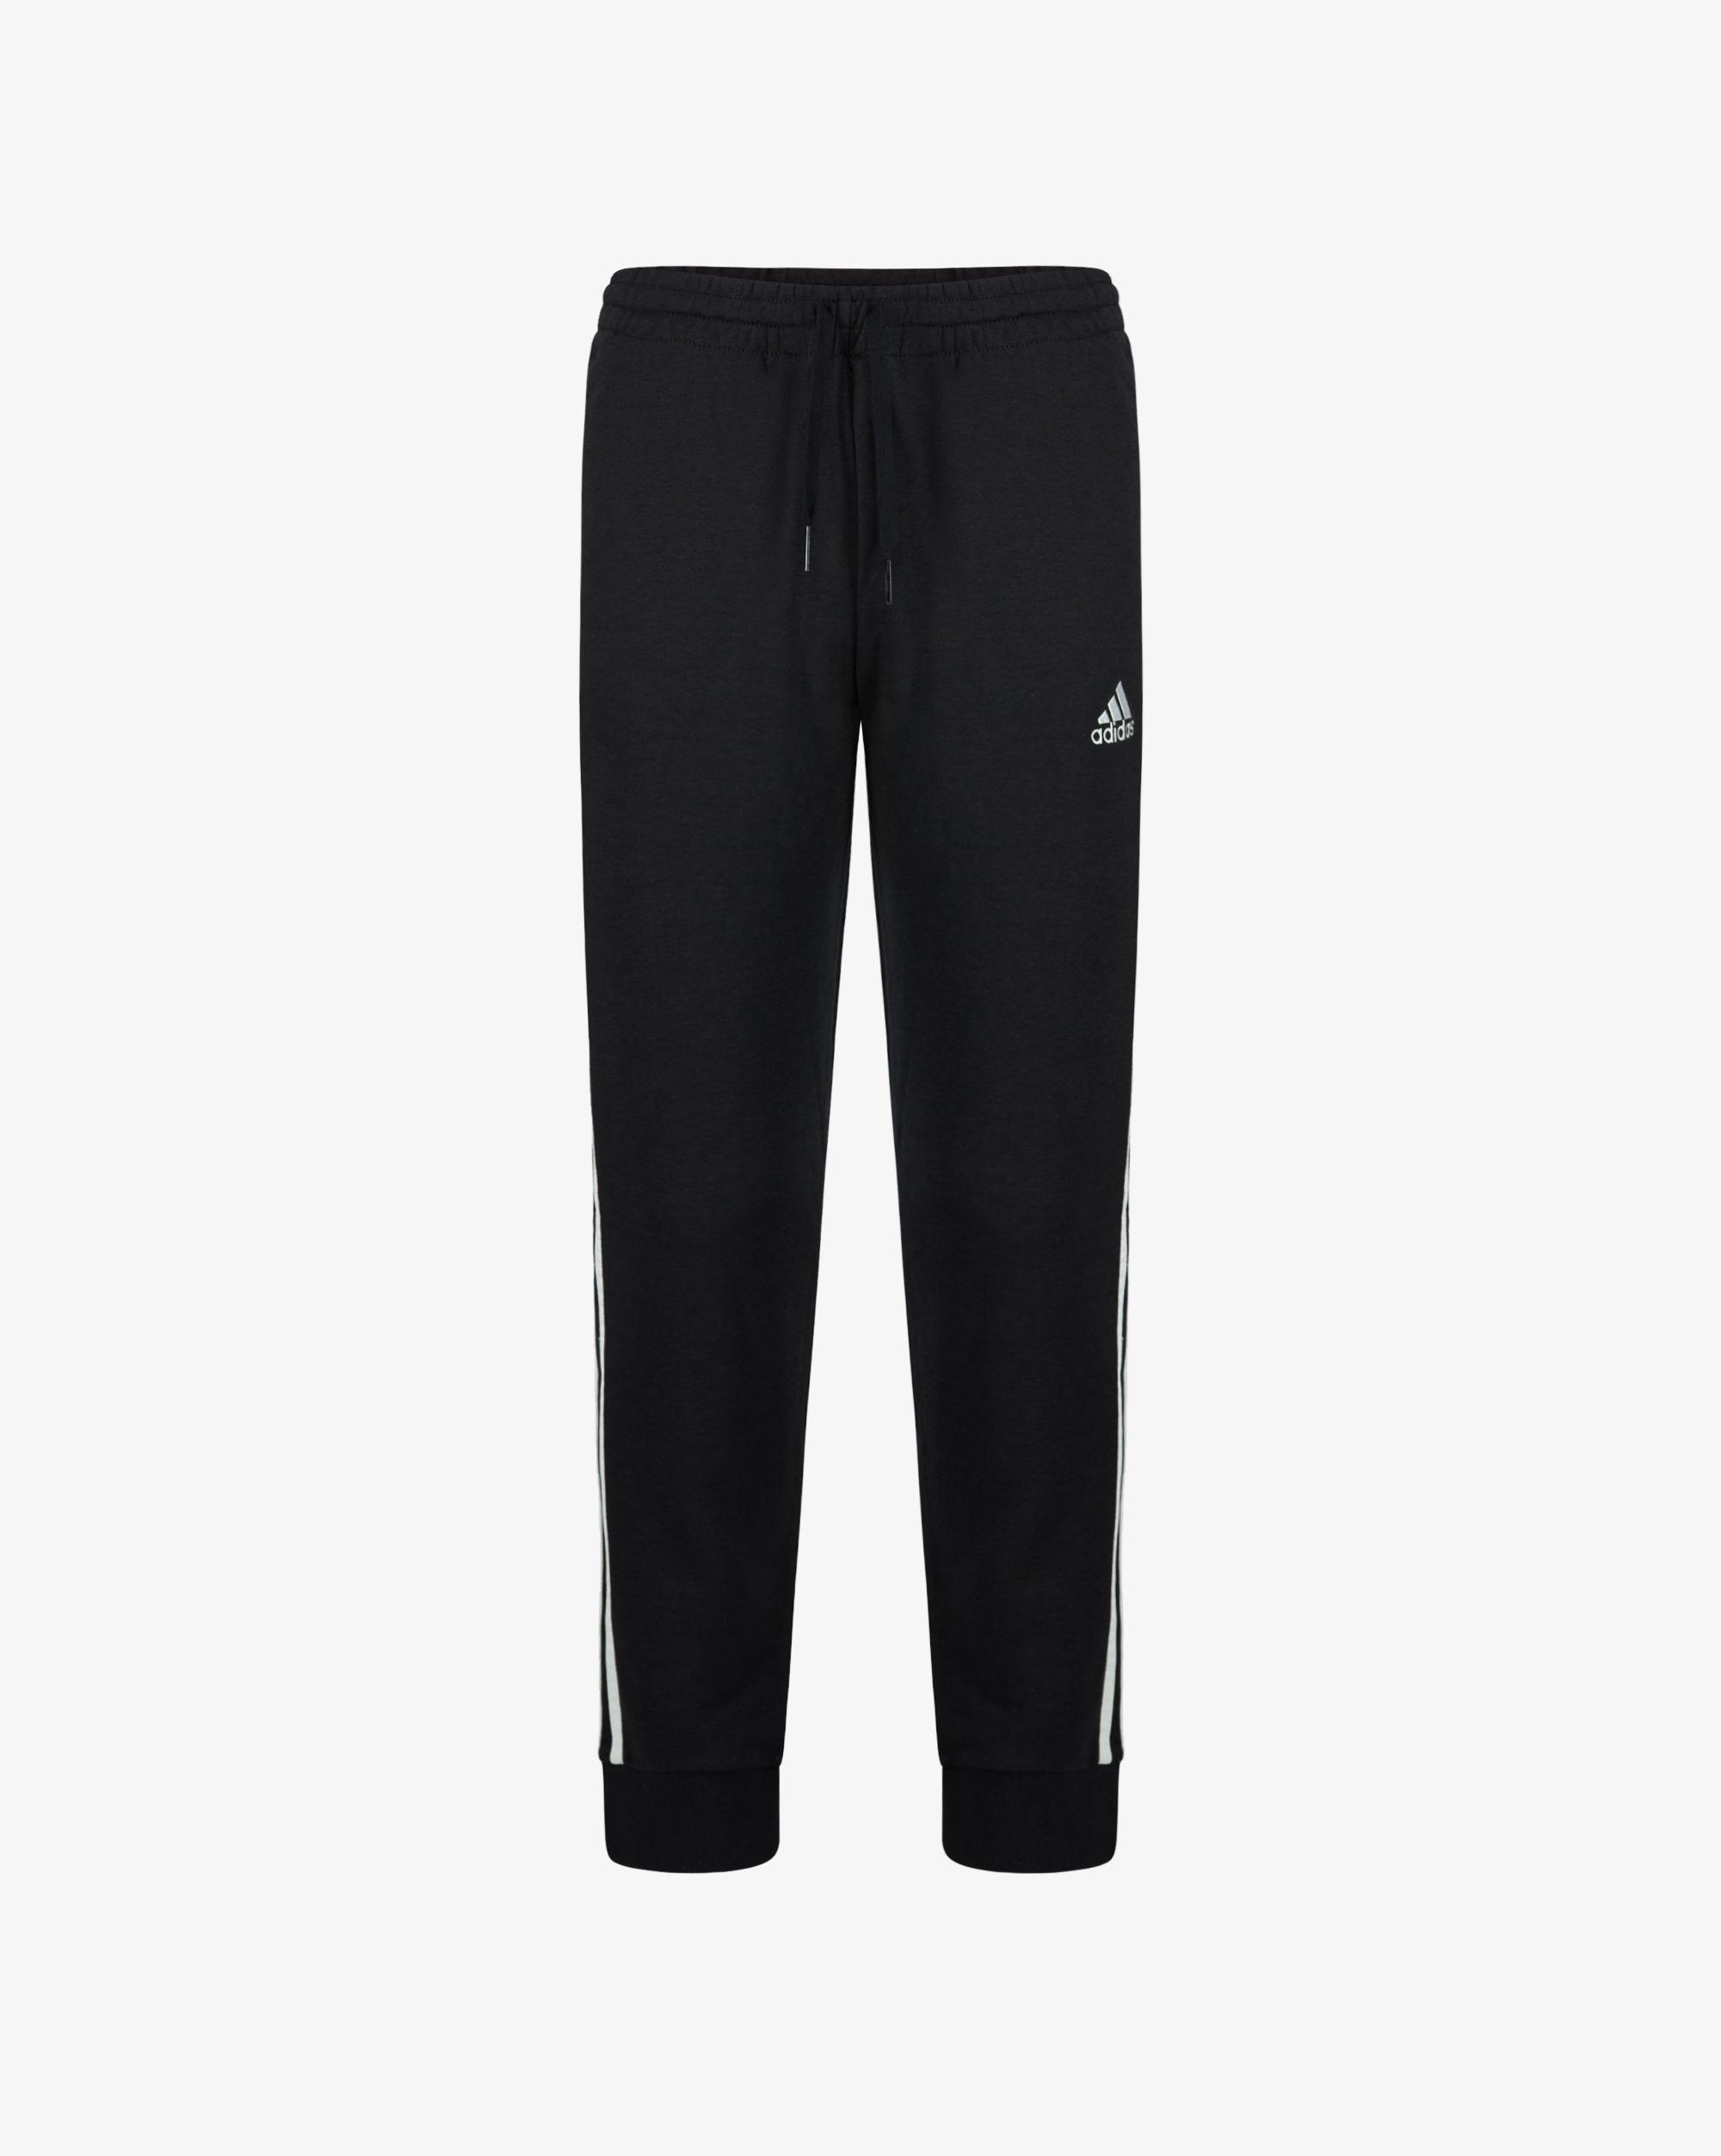 Adidas Pantaloni Essentials French Terry Tapered Cuff 3-Stripes Uomo